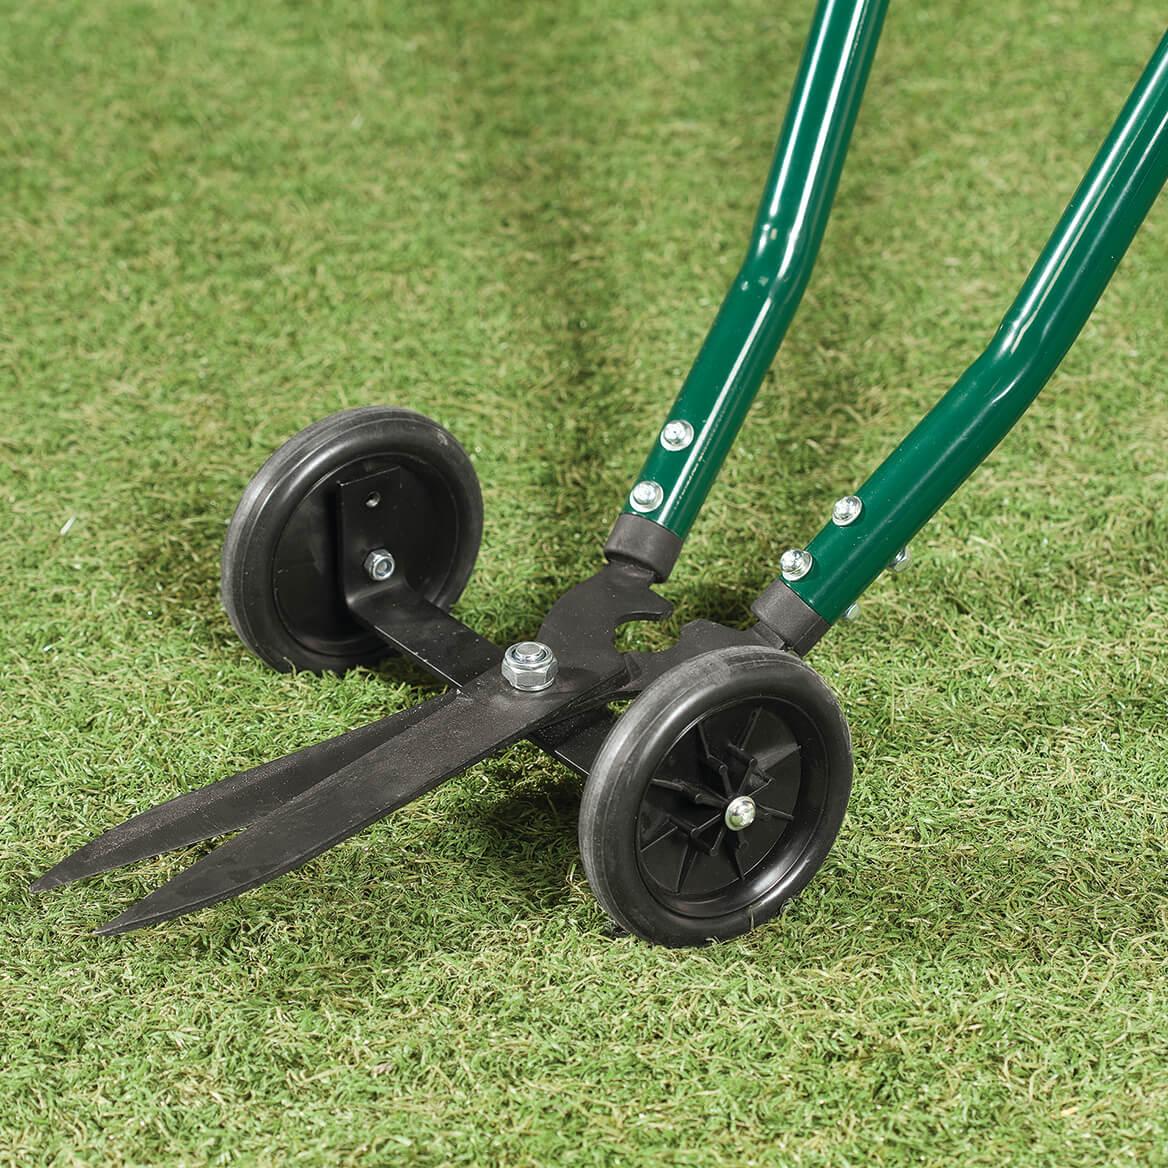 Rolling Grass Trimmer-363305